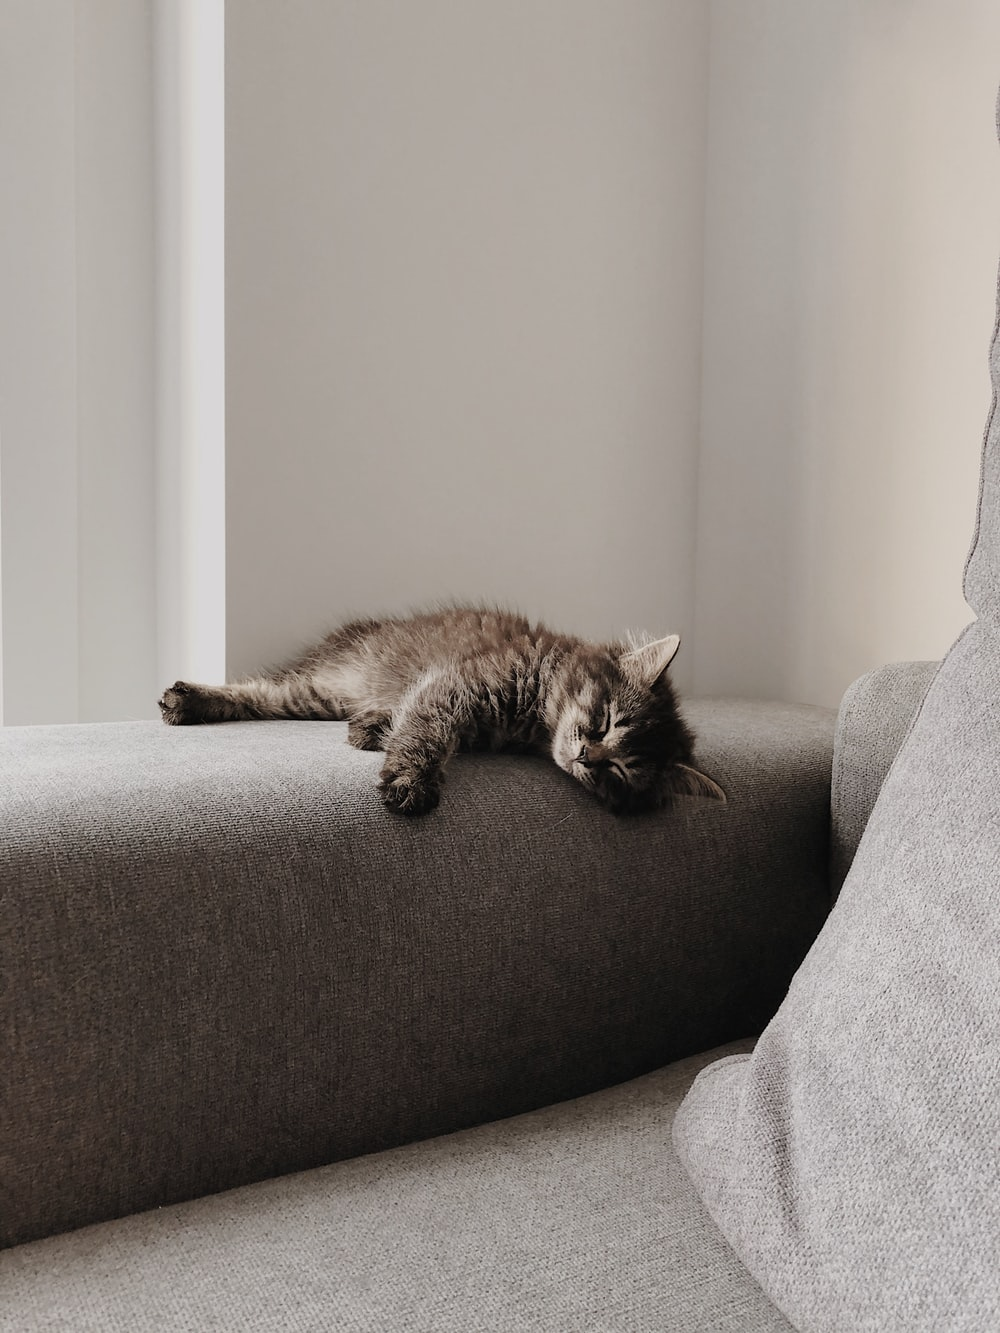 brown tabby cat lying on gray sofa